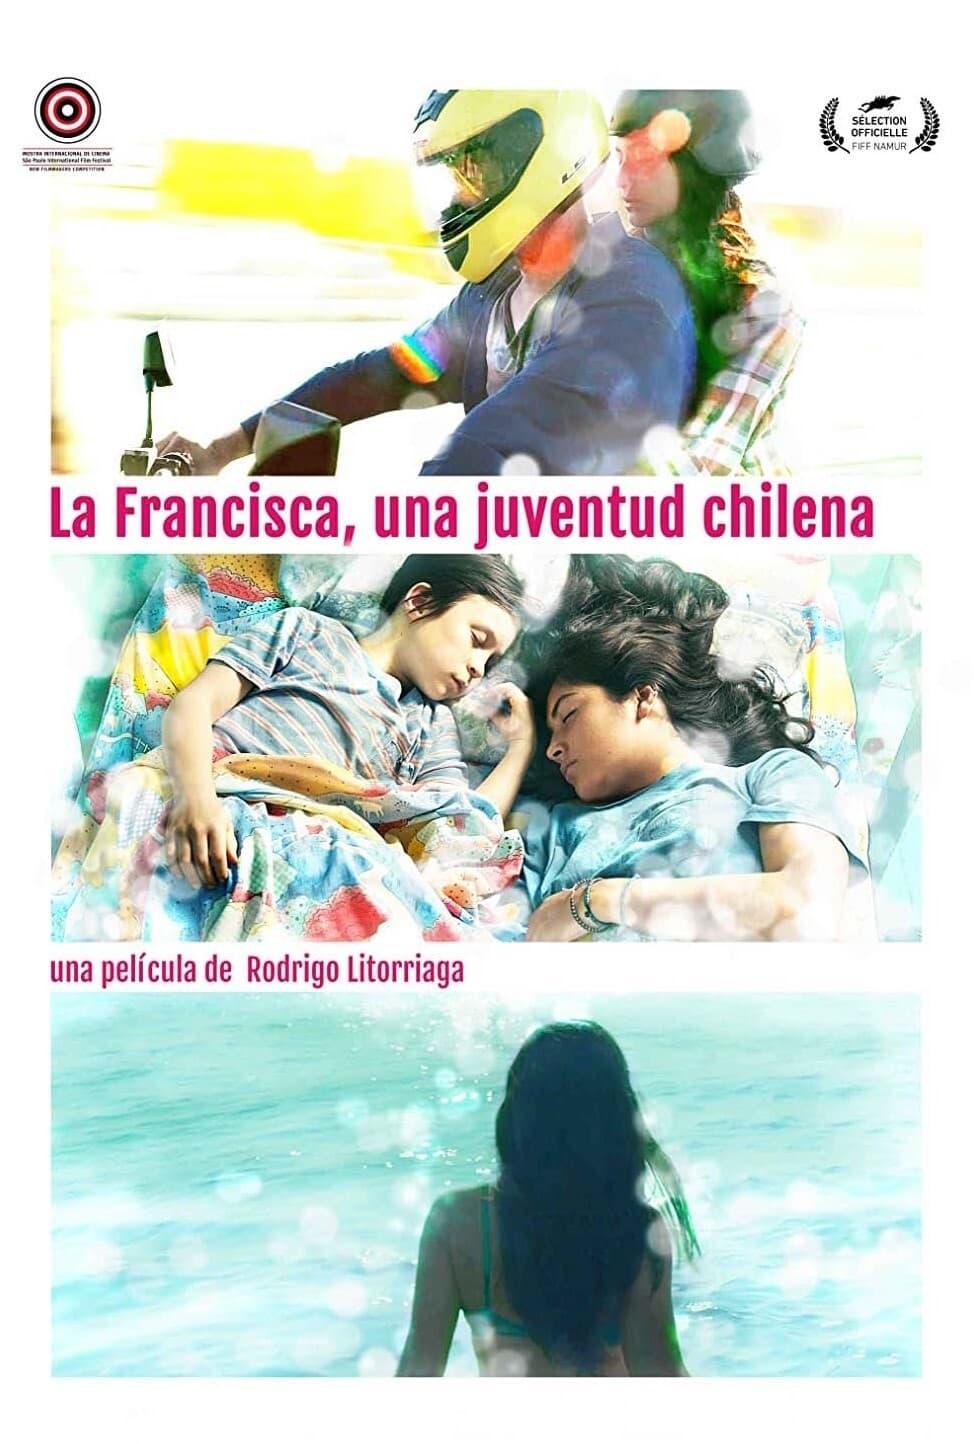 La Francisca, a Chilean Youth